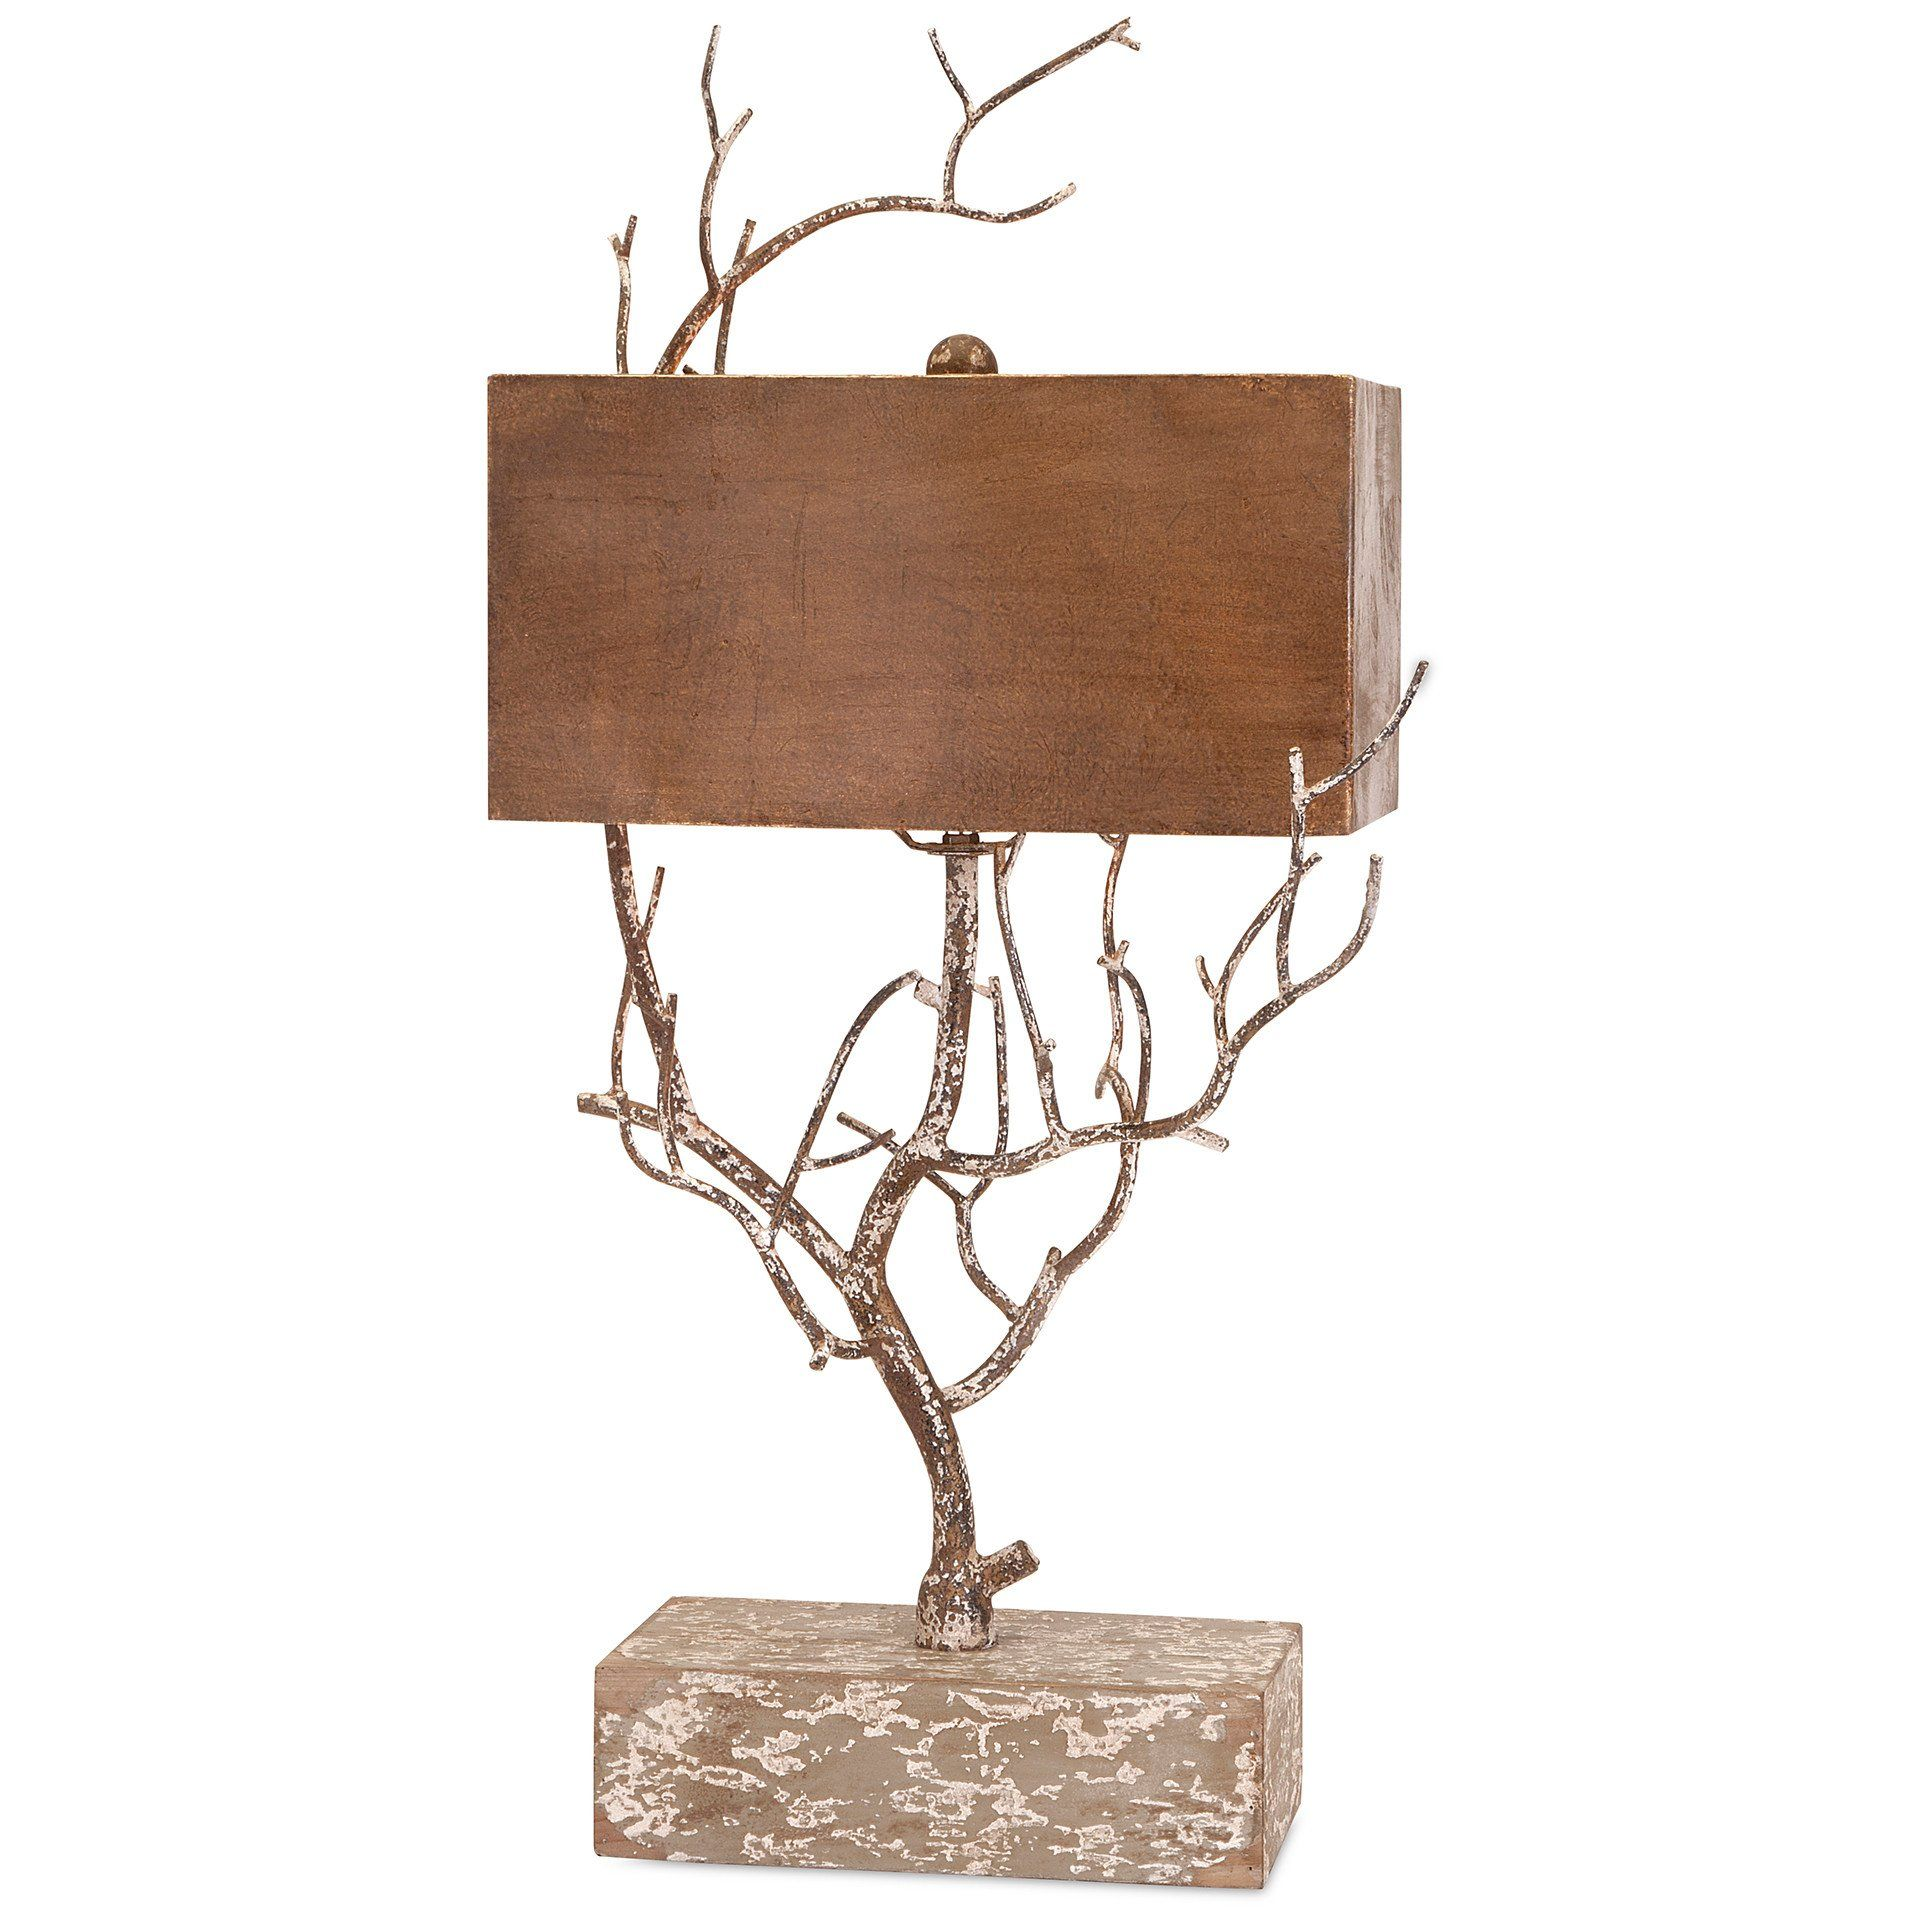 Rustic Lodge Metal Tree Branch Table Lamp Metal Tree Wall Art Metal Tree Tree Lamp